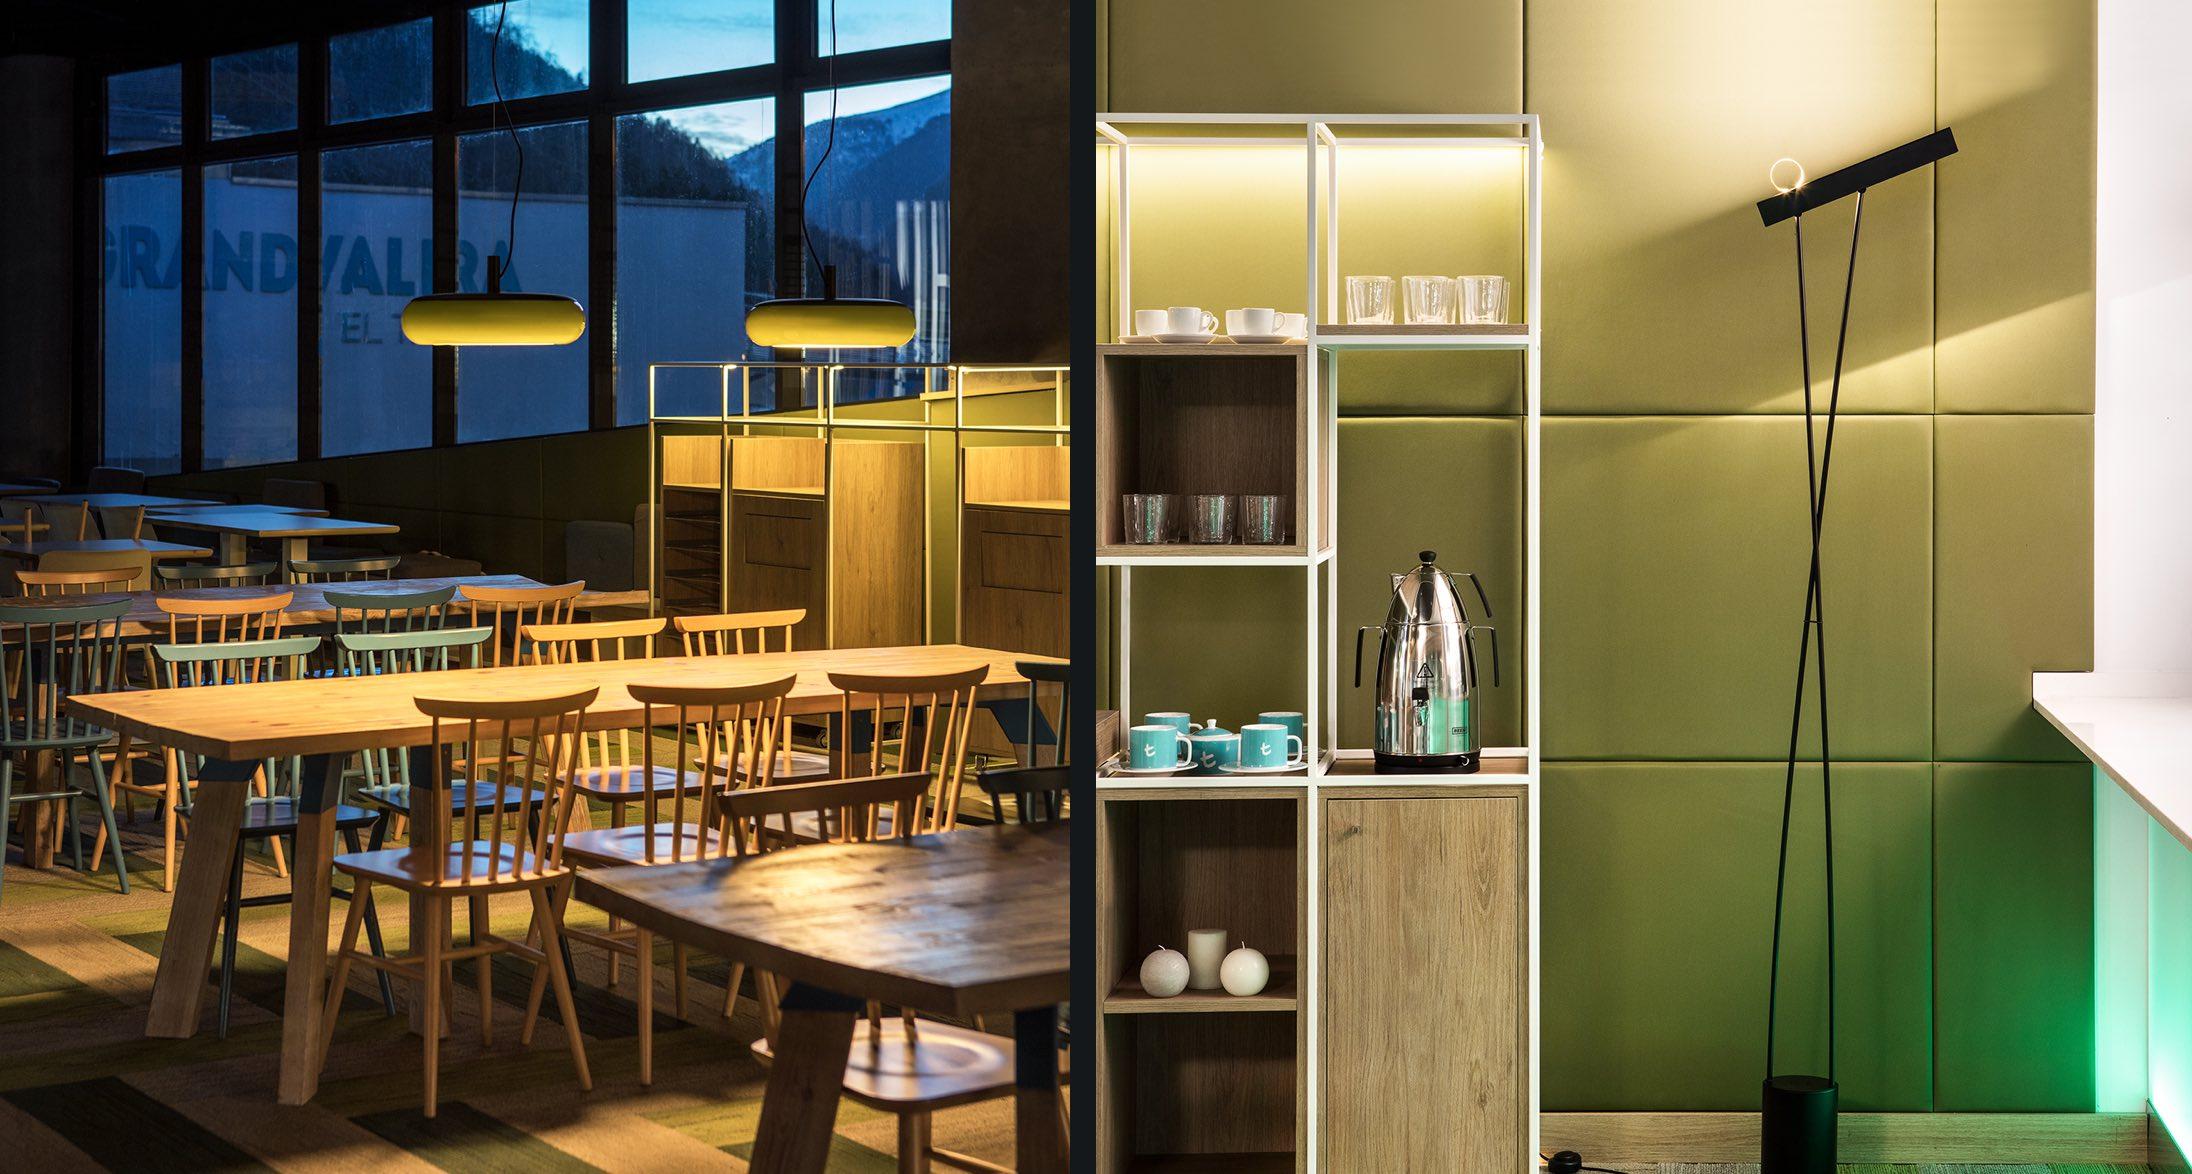 Cafeteria de l'Obac Grandvalira, diseño por Rosa Colet